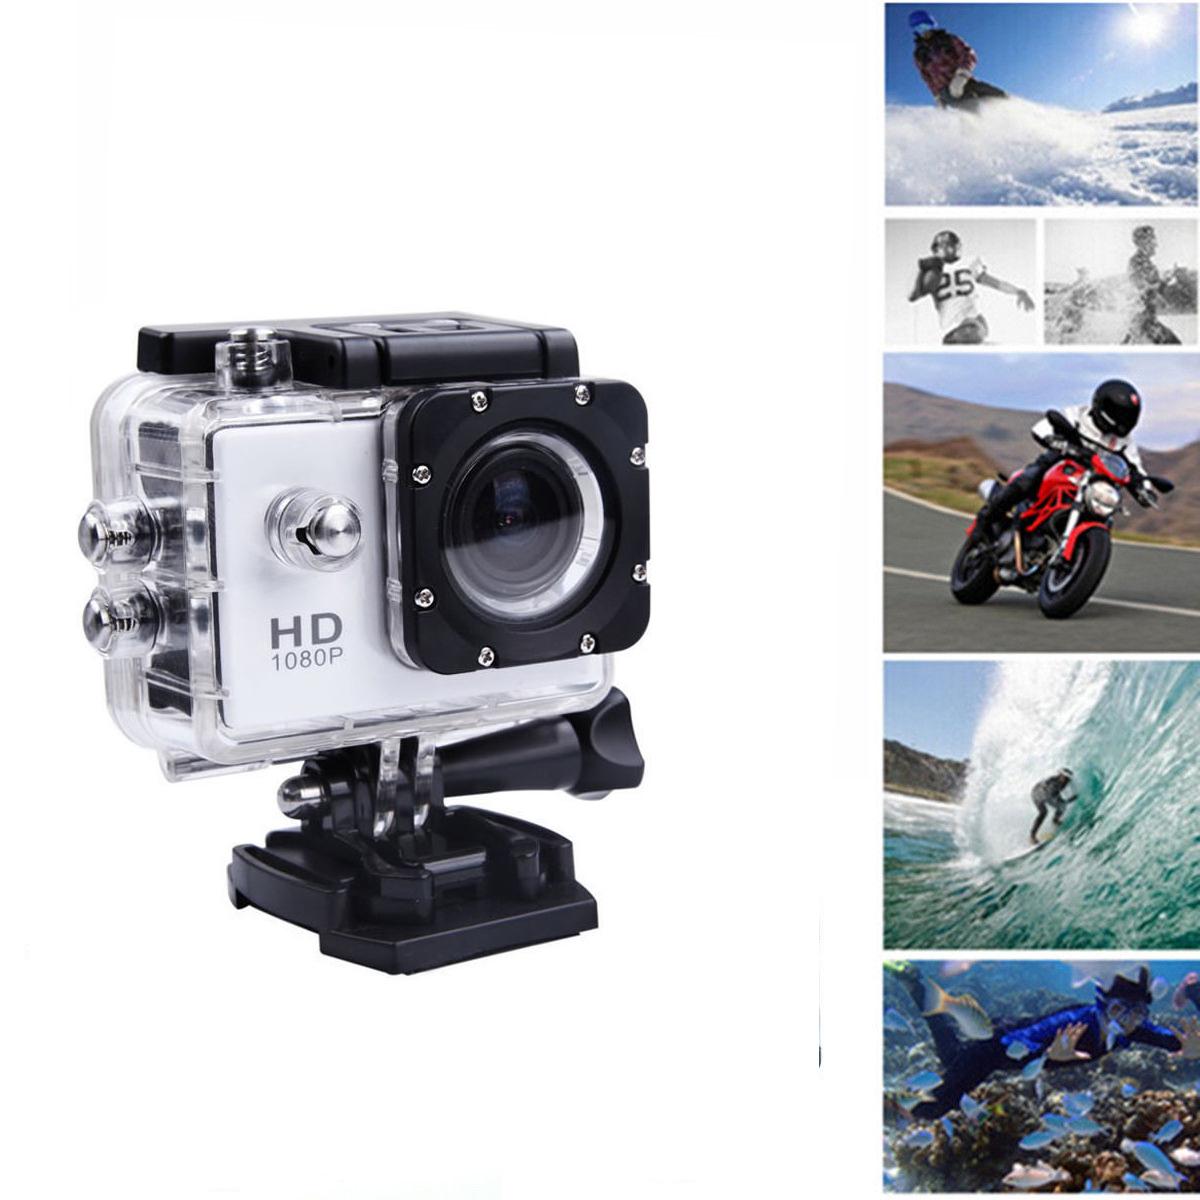 New Full HD SJ4000 1080P 12MP Car Cam Sports DV Action Waterproof Camera